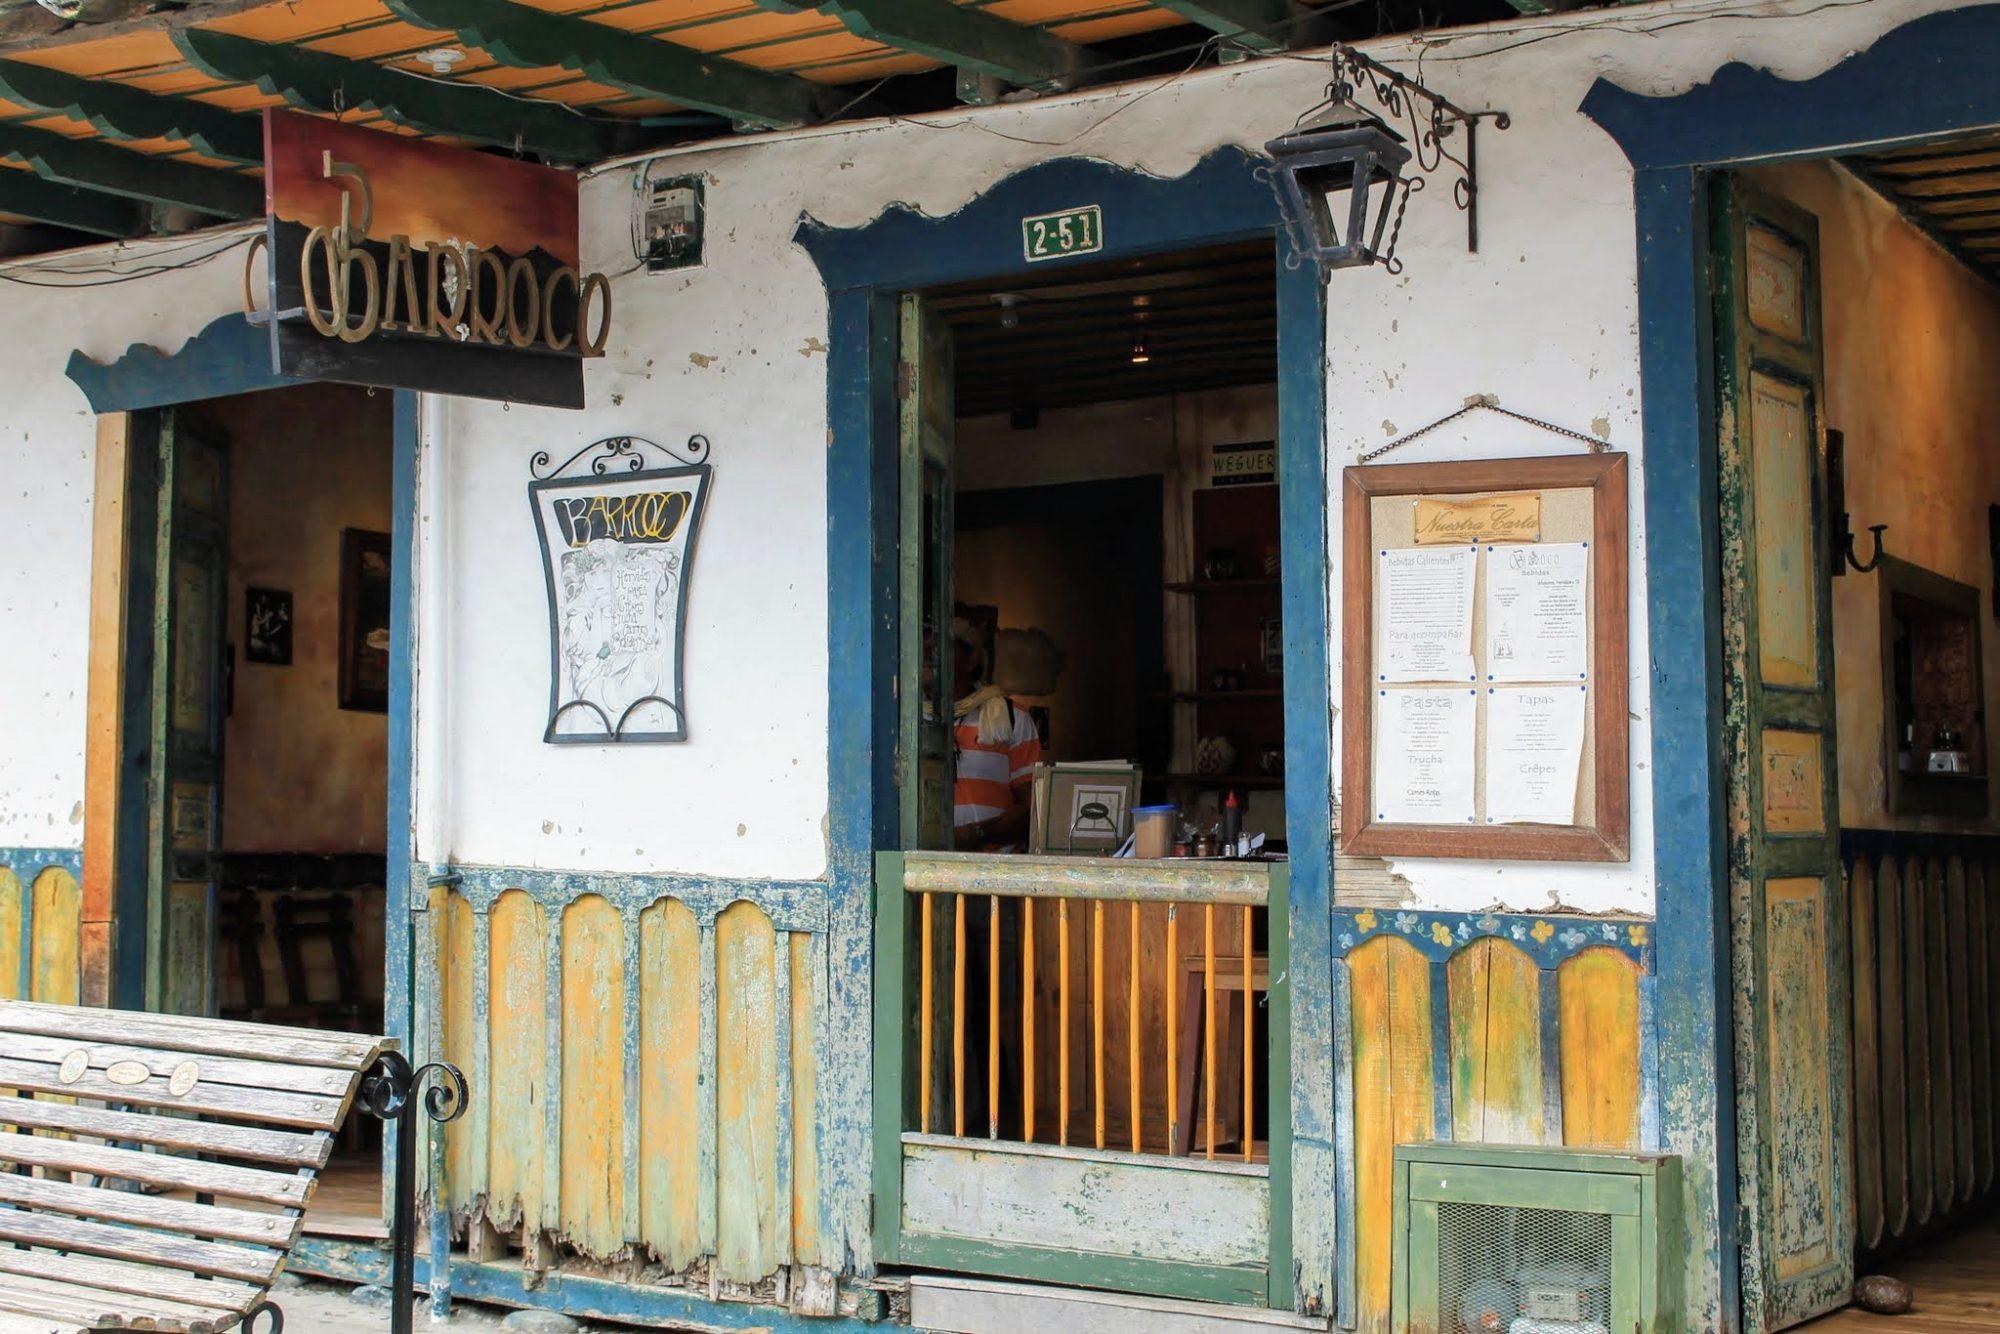 Colombia Koffiedriehoek - Salento